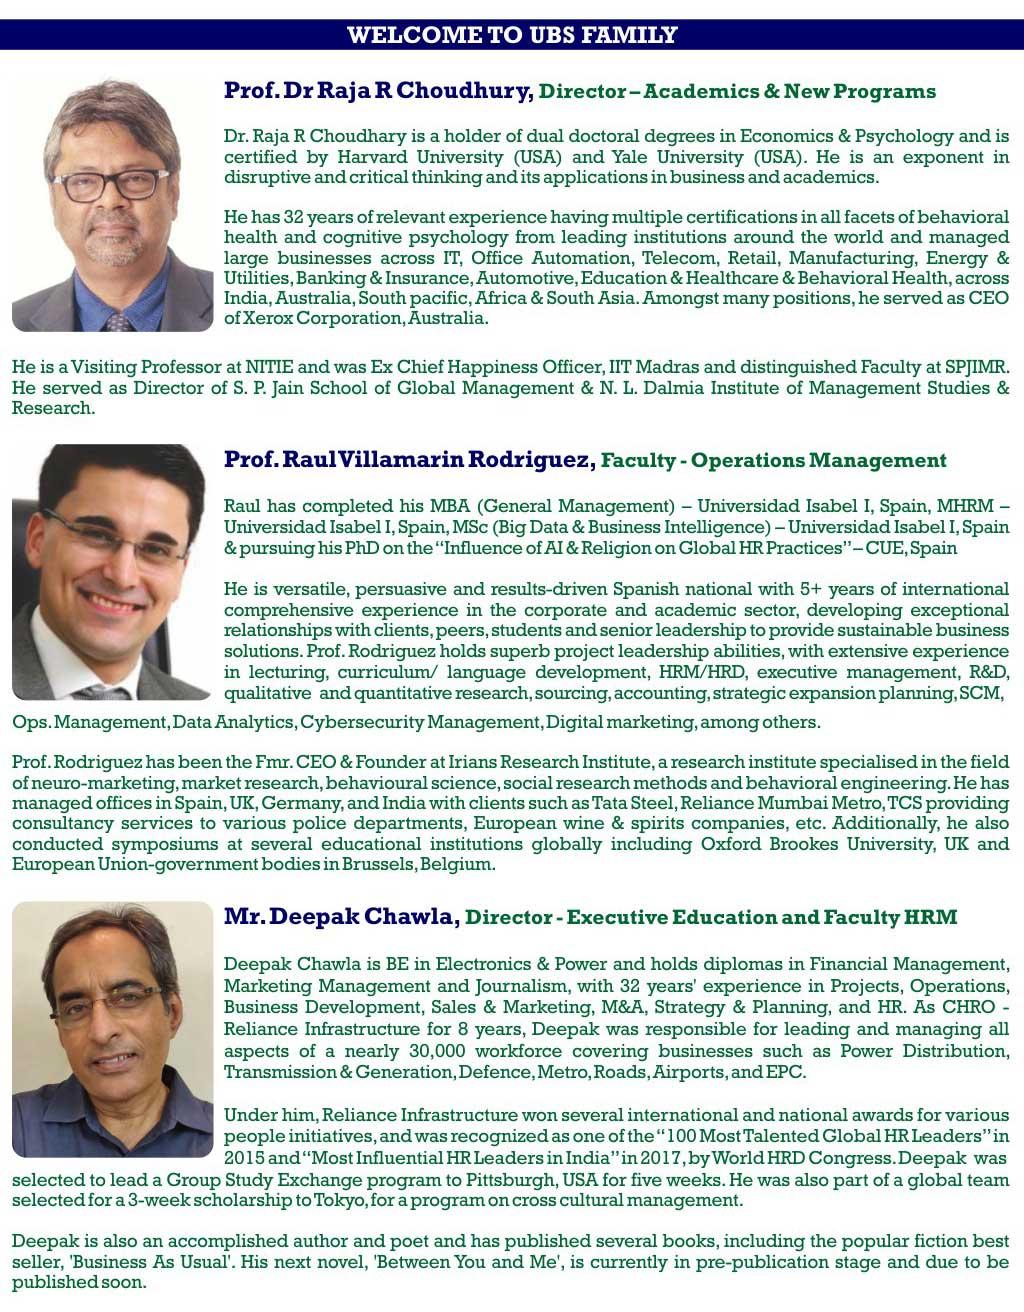 1 year MBA in India from Top B-school of Mumbai